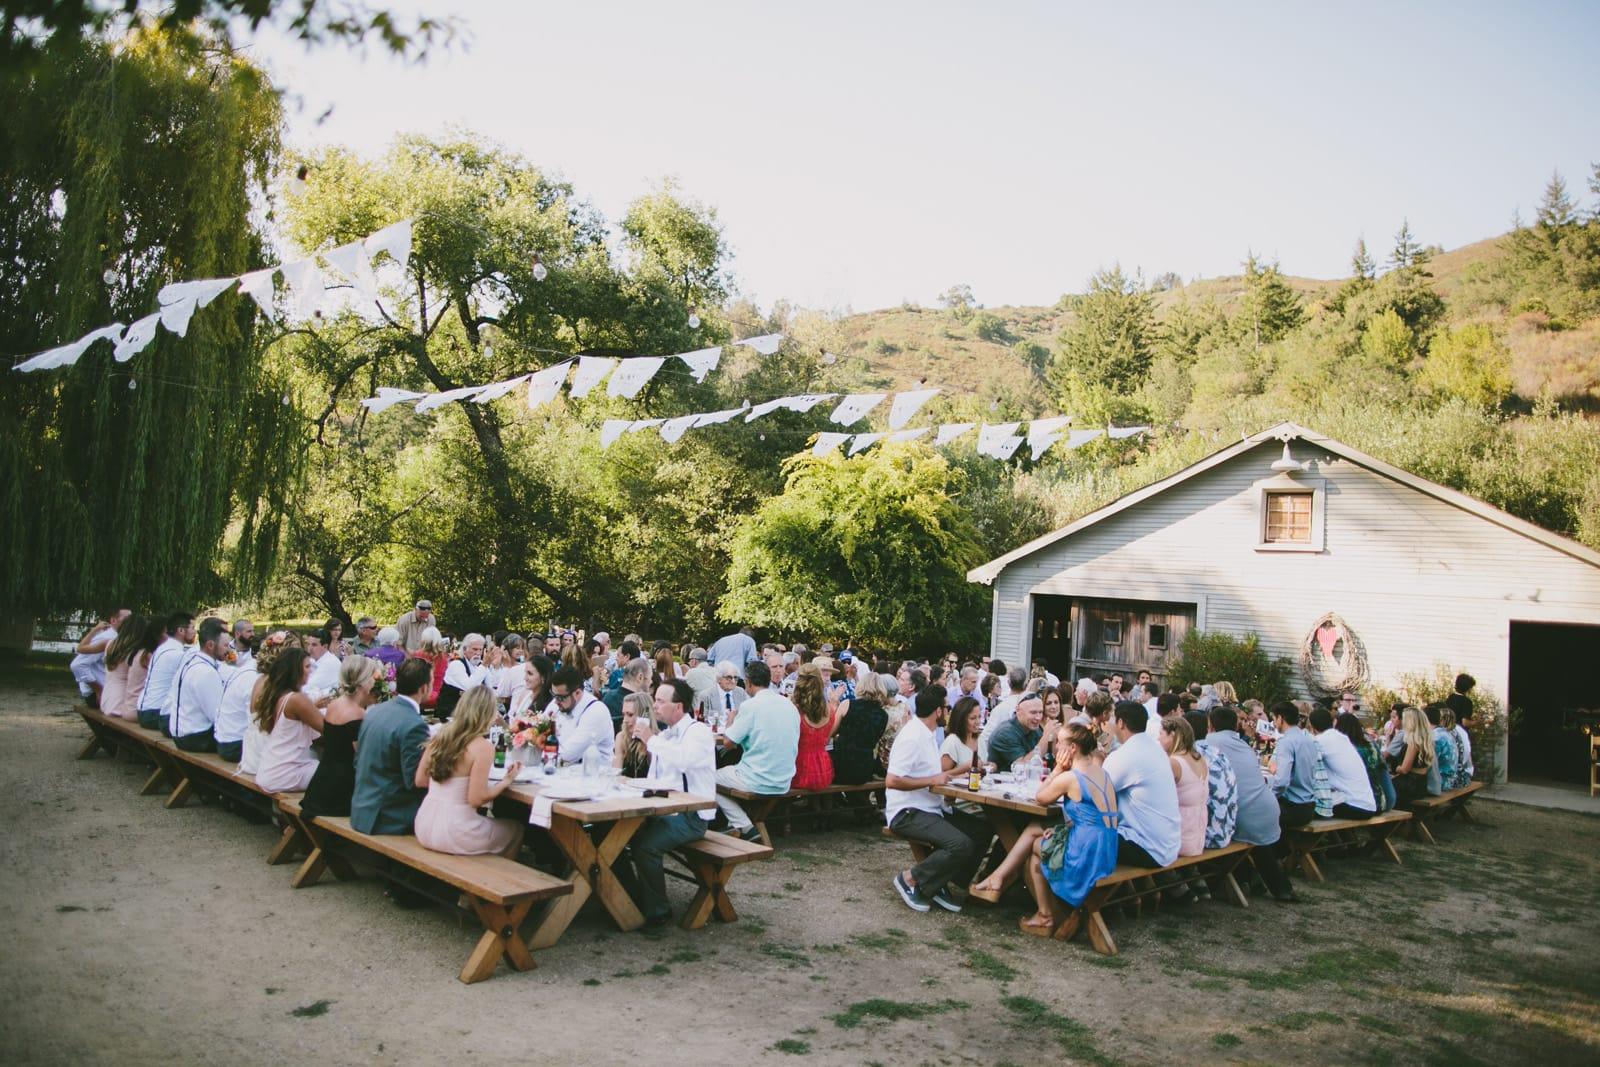 radonich_ranch_wedding_los_gatos_wedding_054